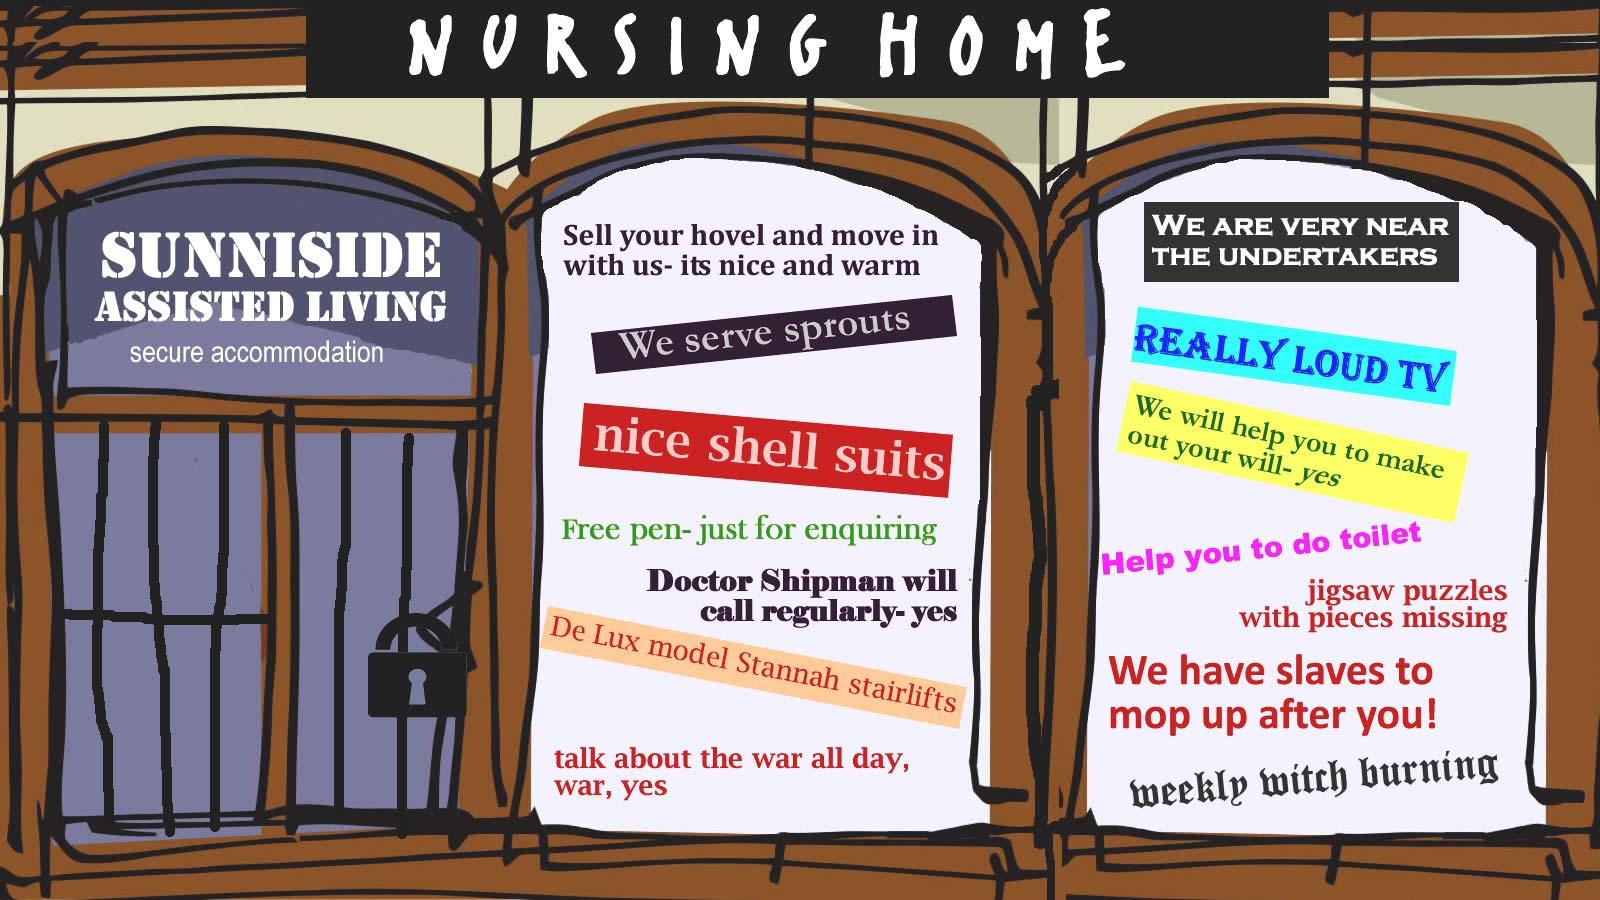 Sunniside Nursing Home